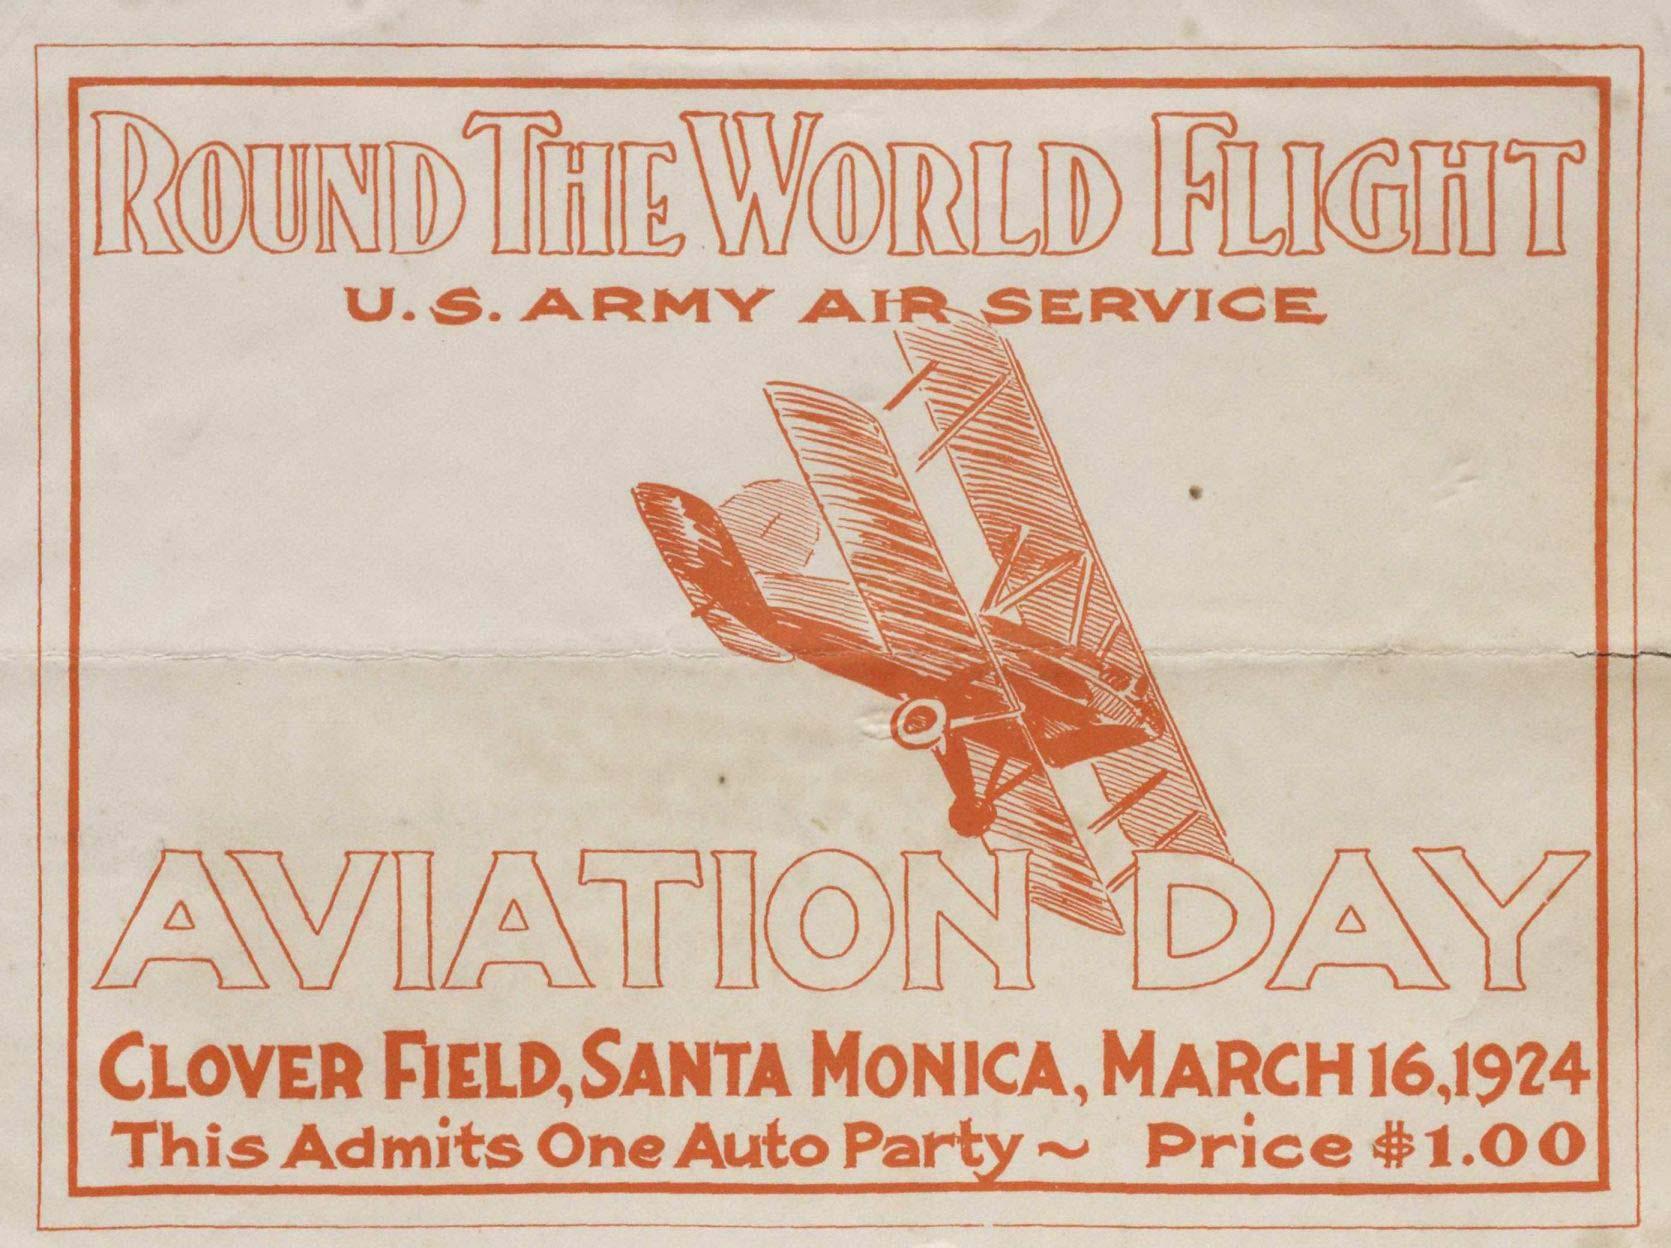 1924 circumnavigation ticket